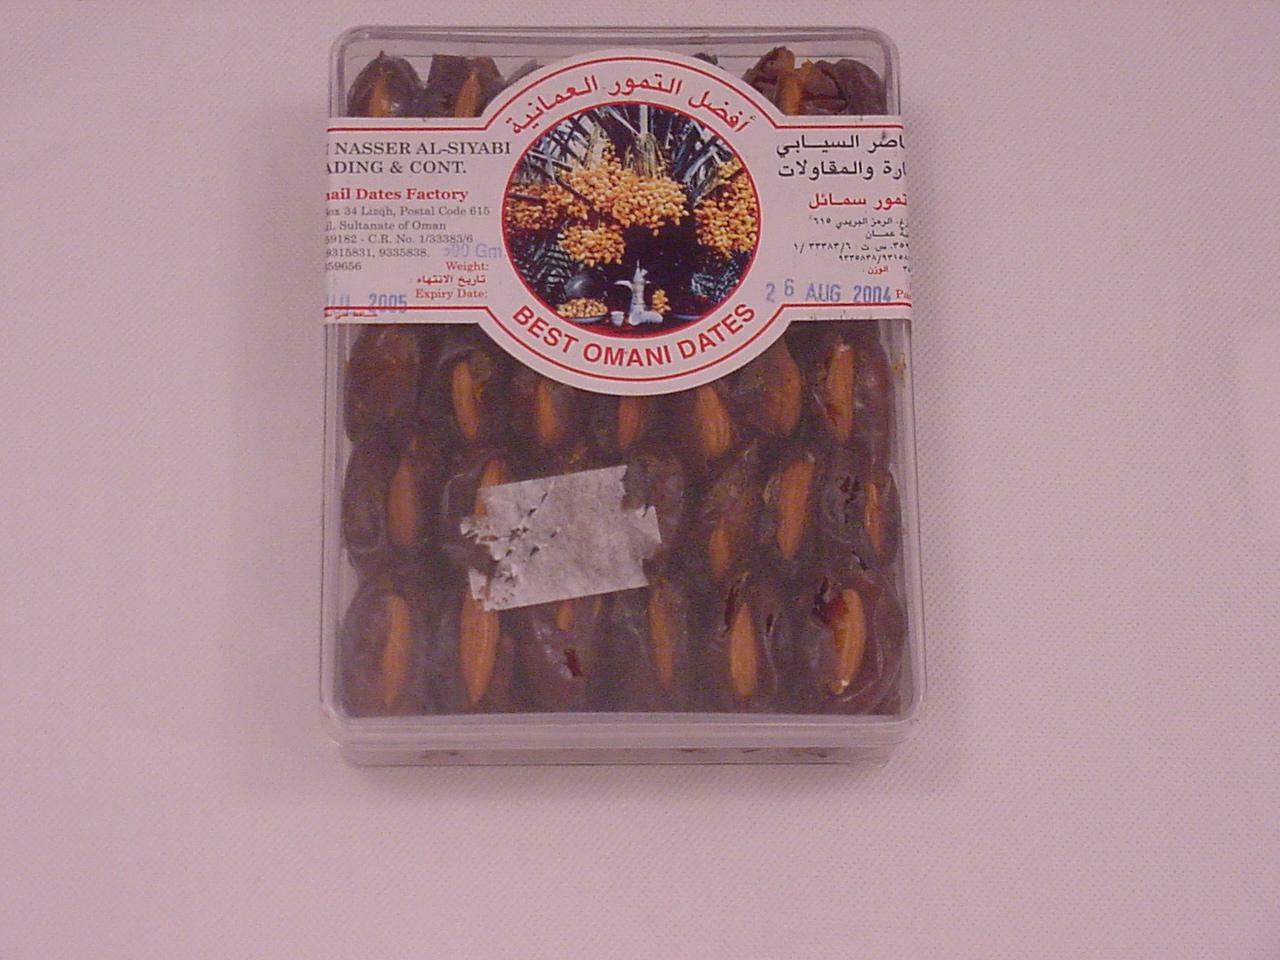 Omani Dates